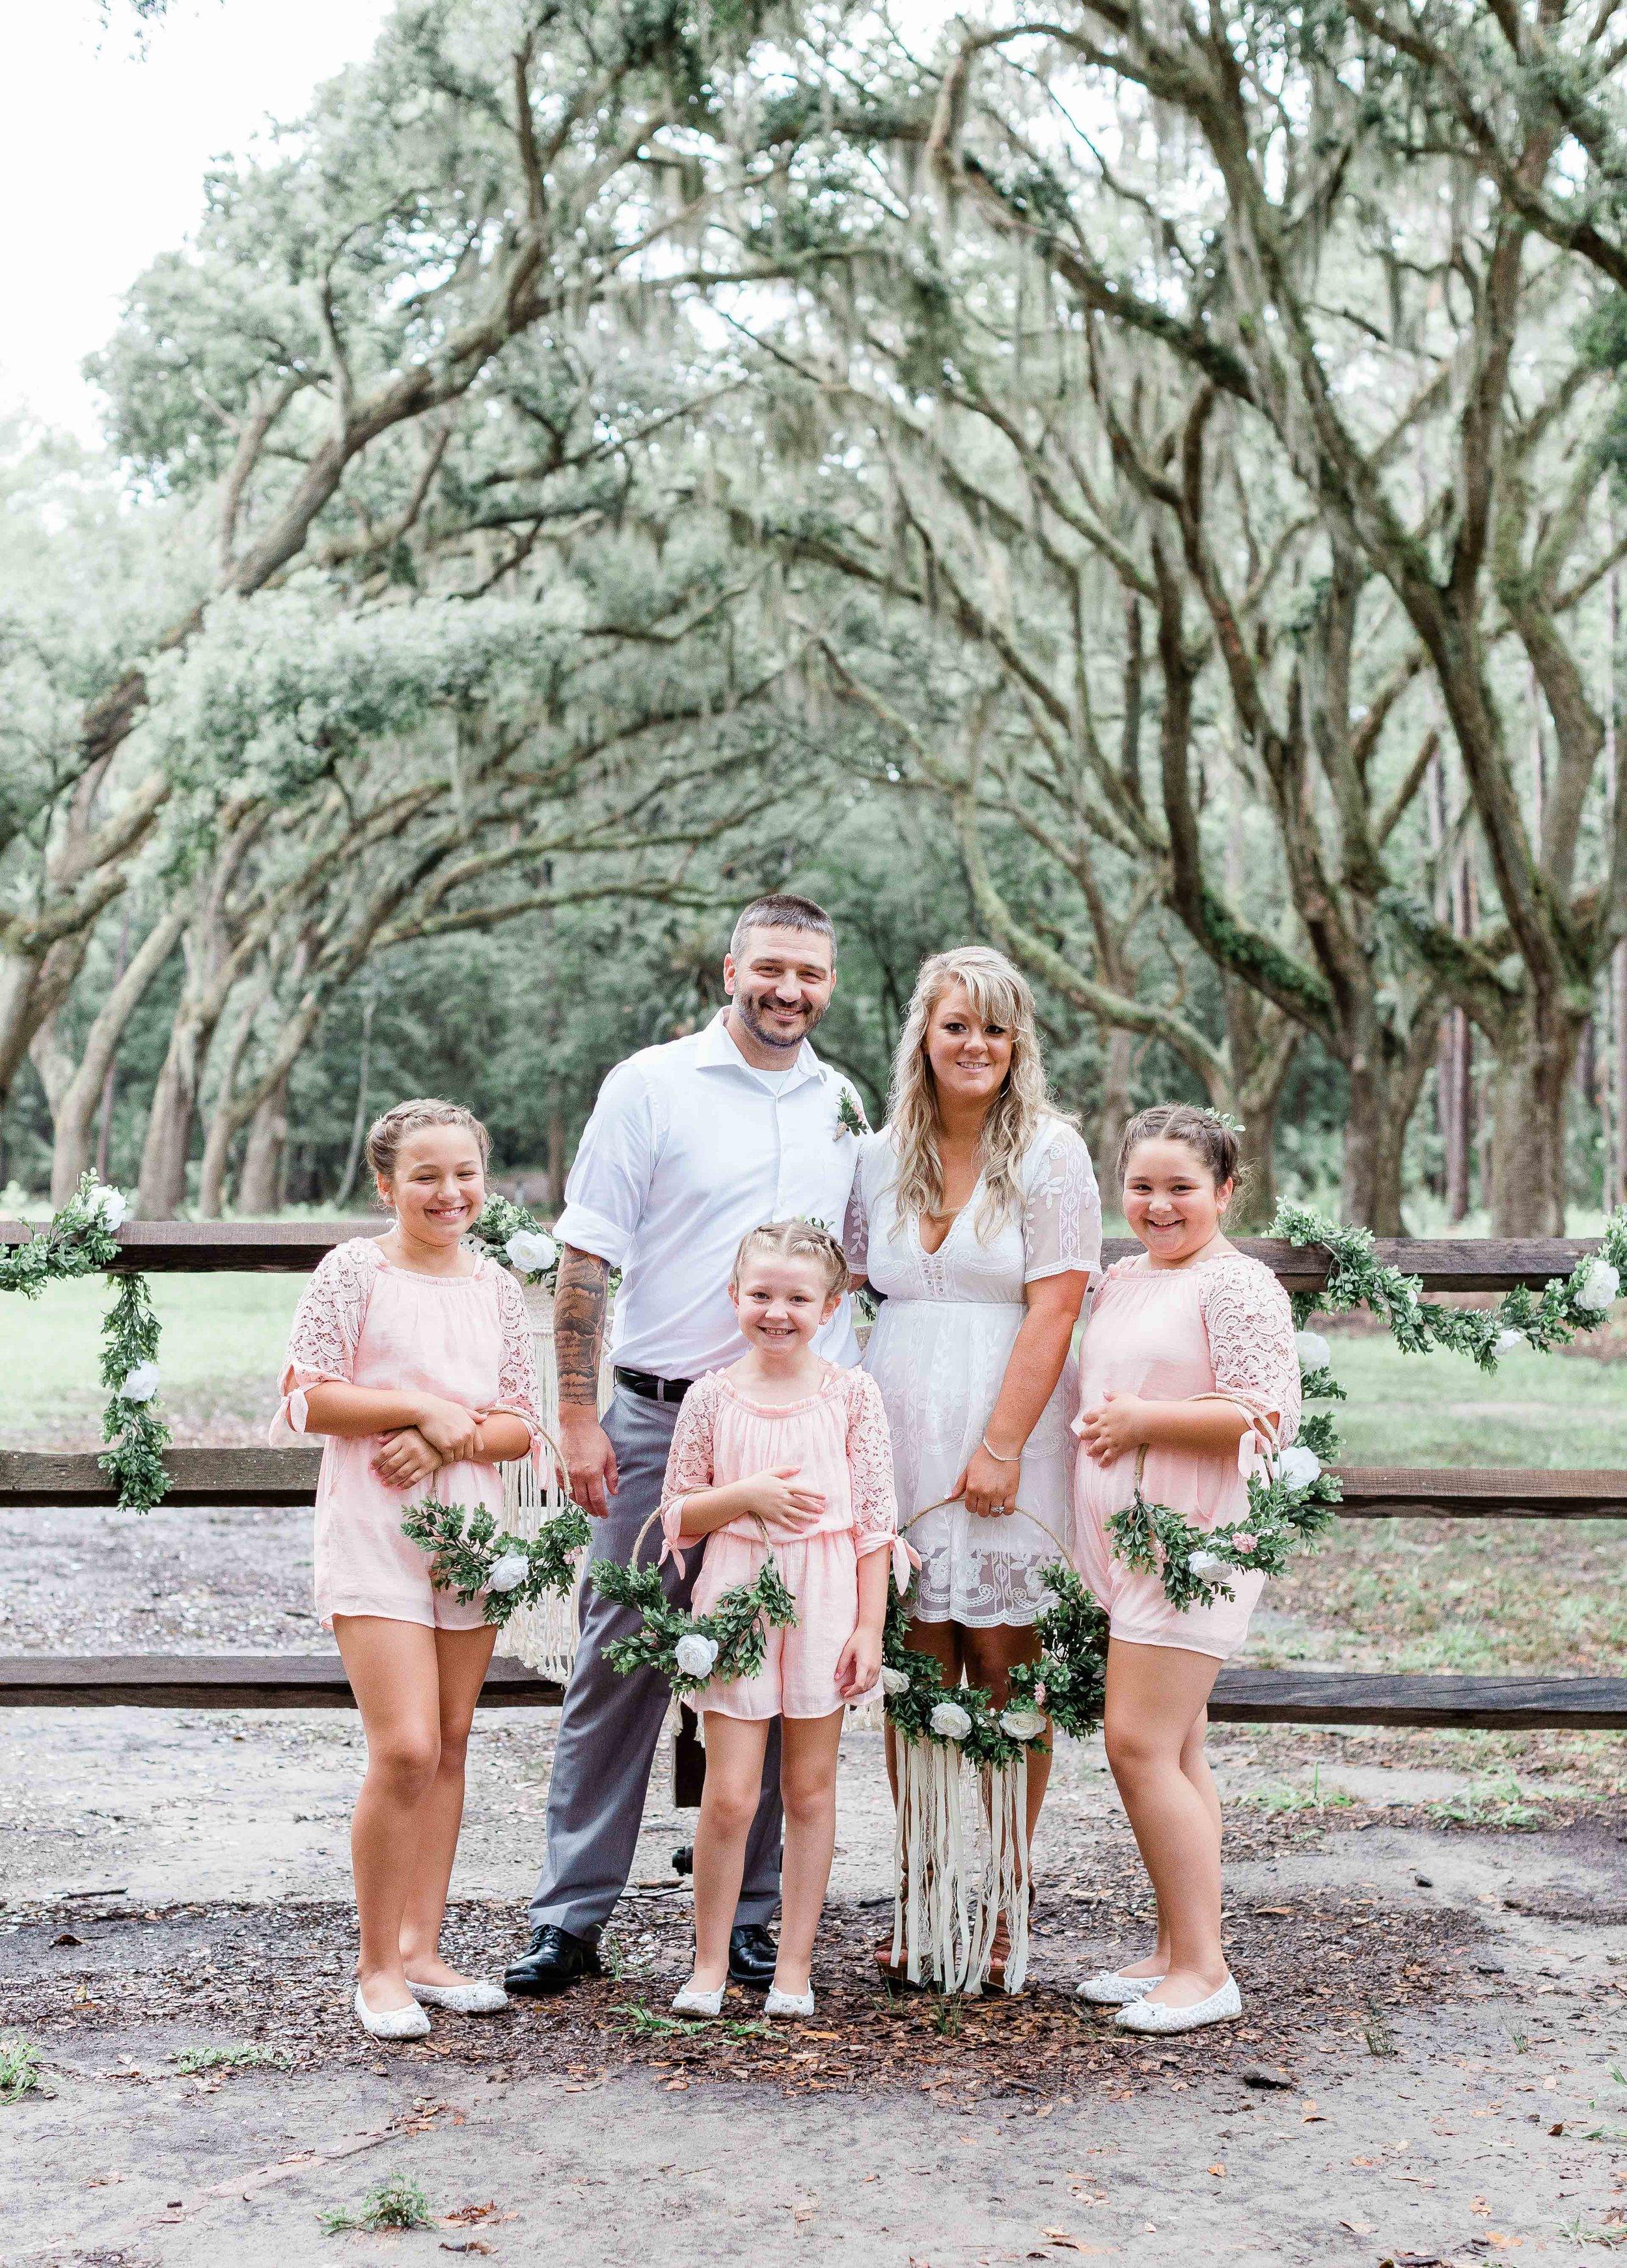 20190727Georgia-Wormlsoe Plantation-Simply Eloped-Savannah Wedding Photographer- Southern Lens Photography05.jpg